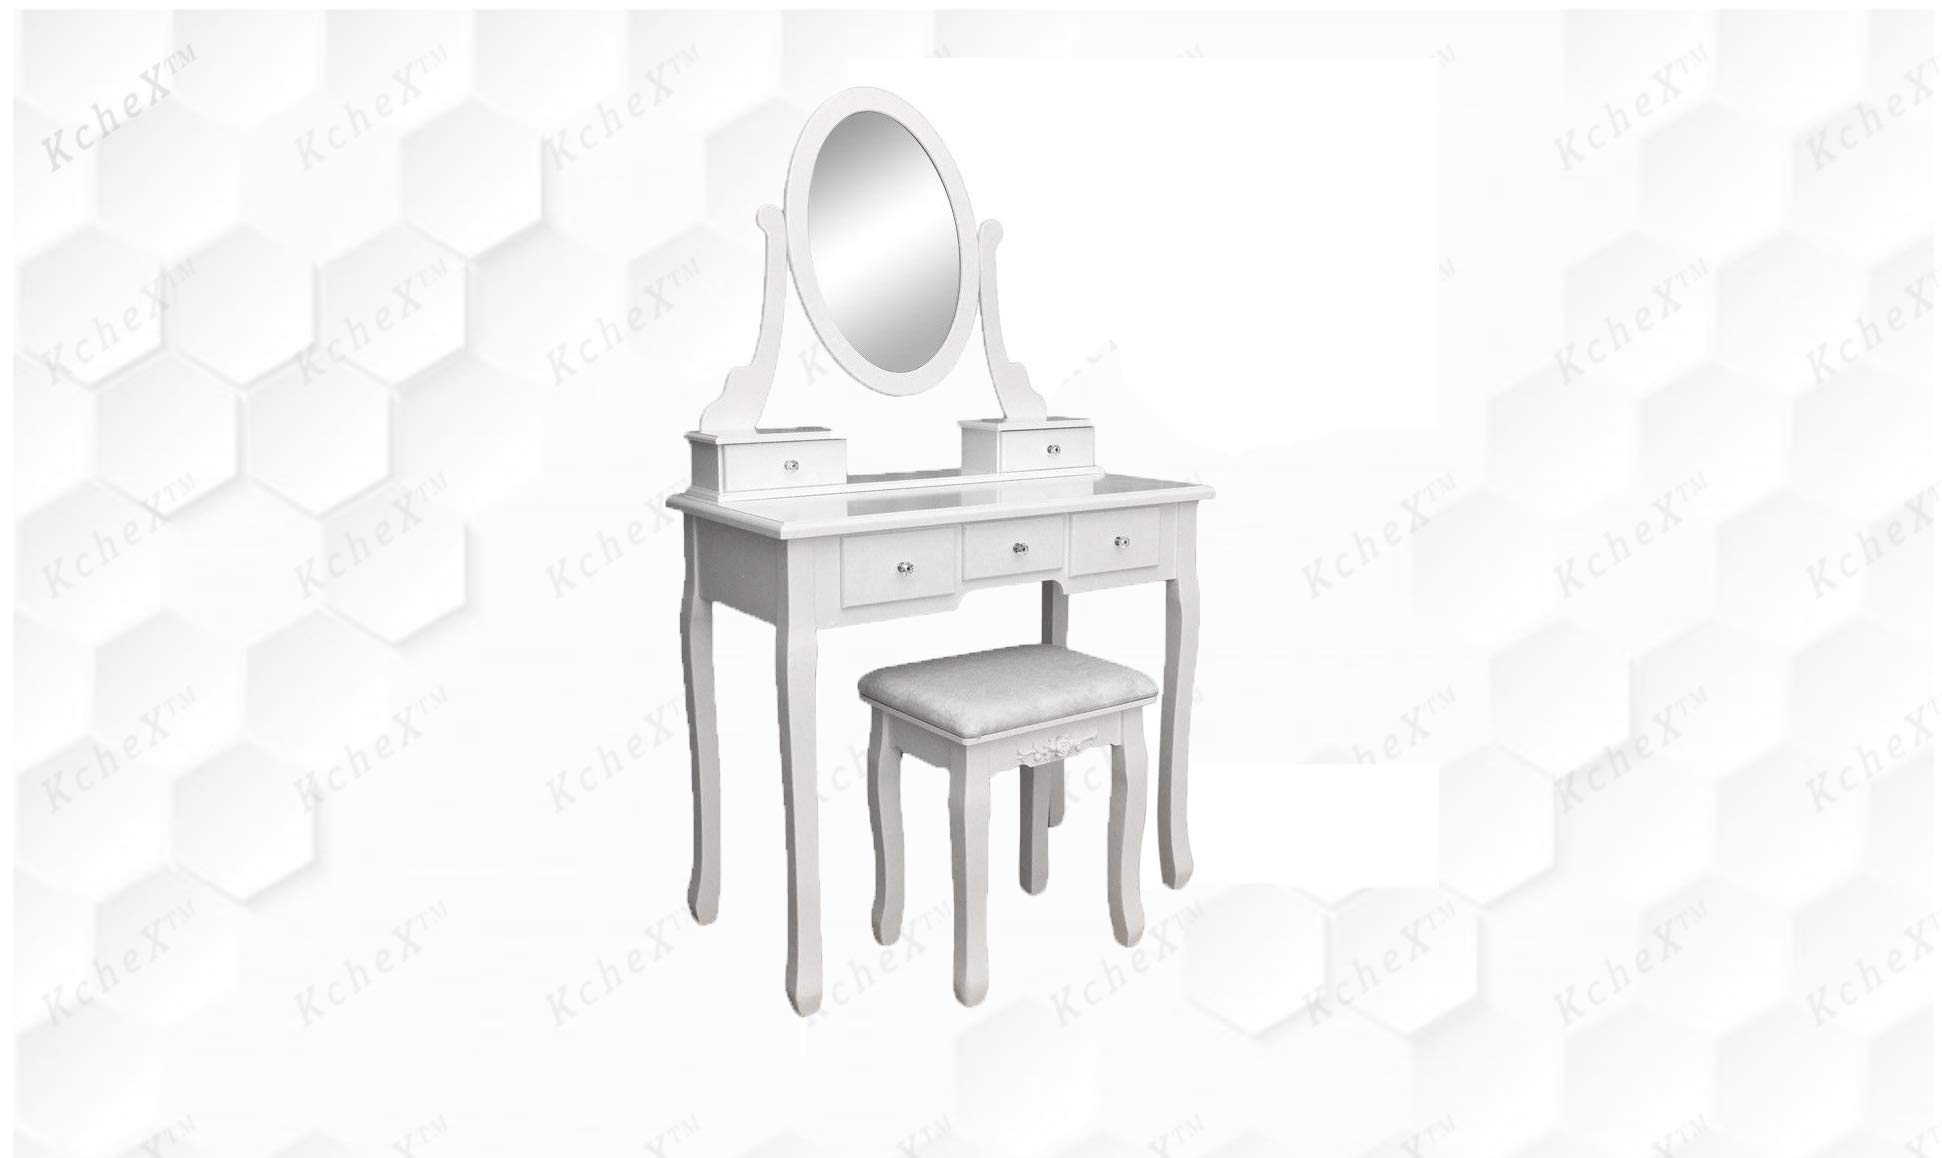 KCHEX__Vanity Makeup Dressing Table